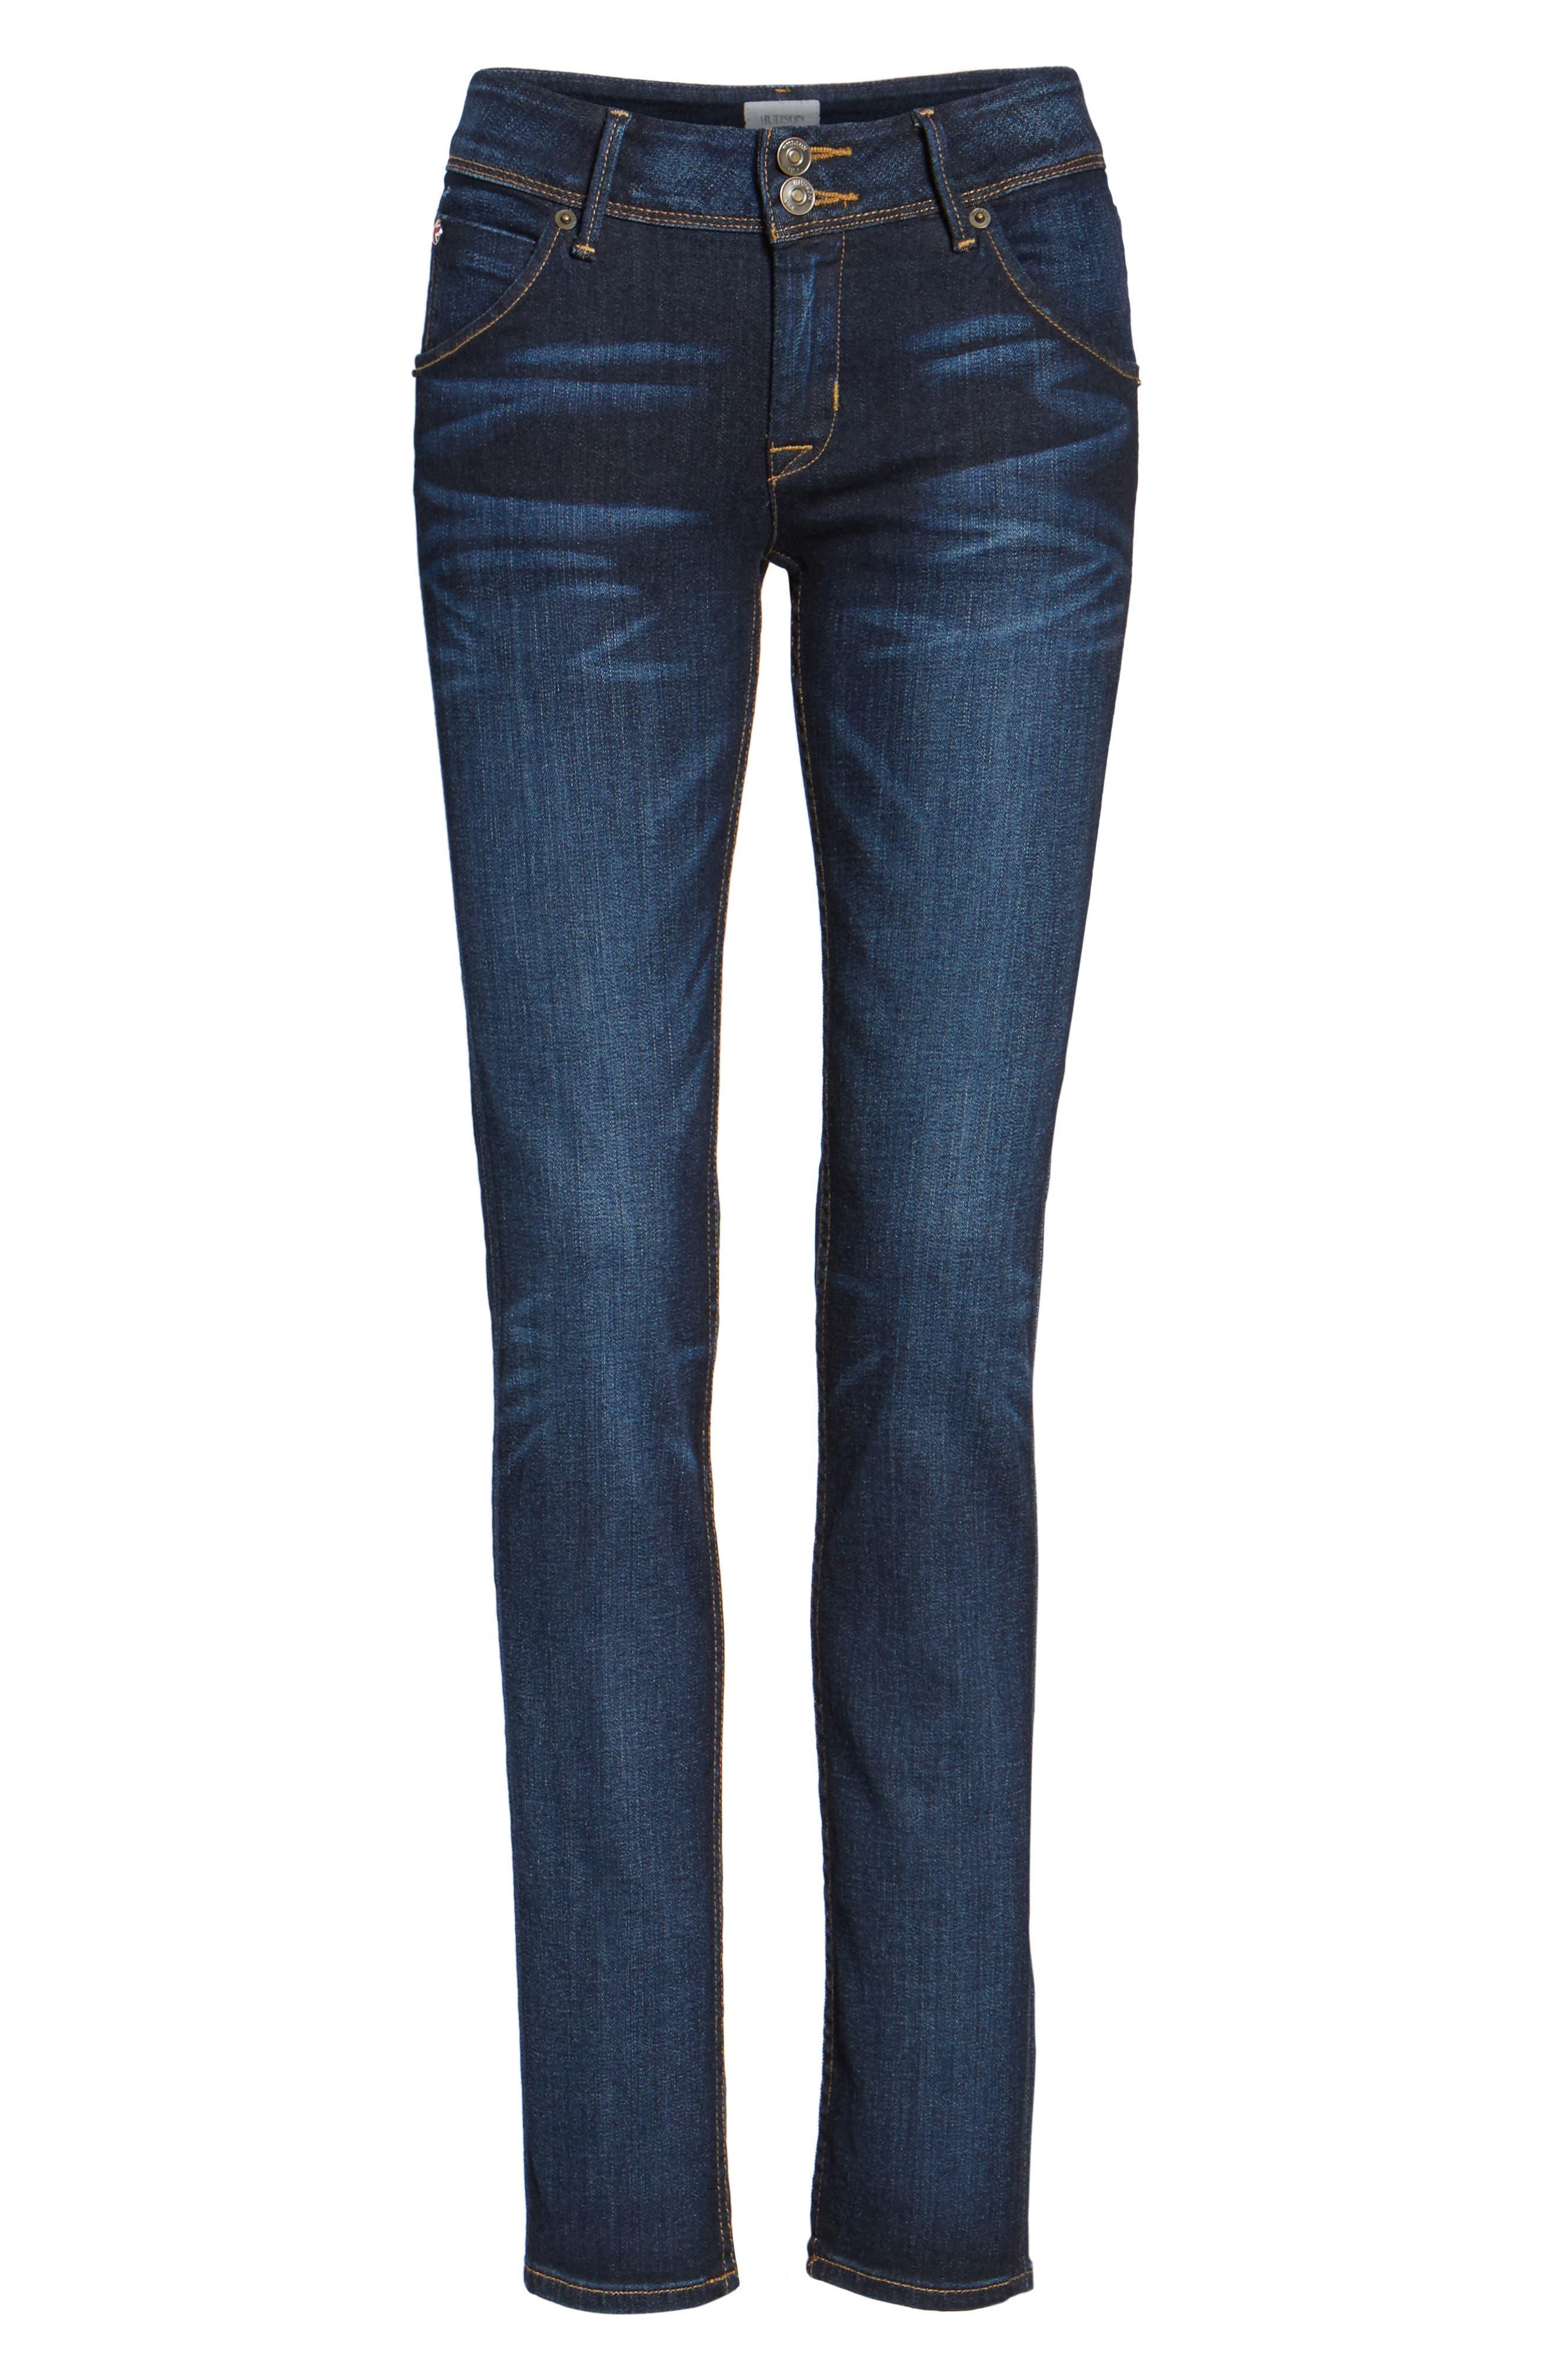 'Collin' Supermodel Skinny Jeans,                             Alternate thumbnail 6, color,                             CREST FALL